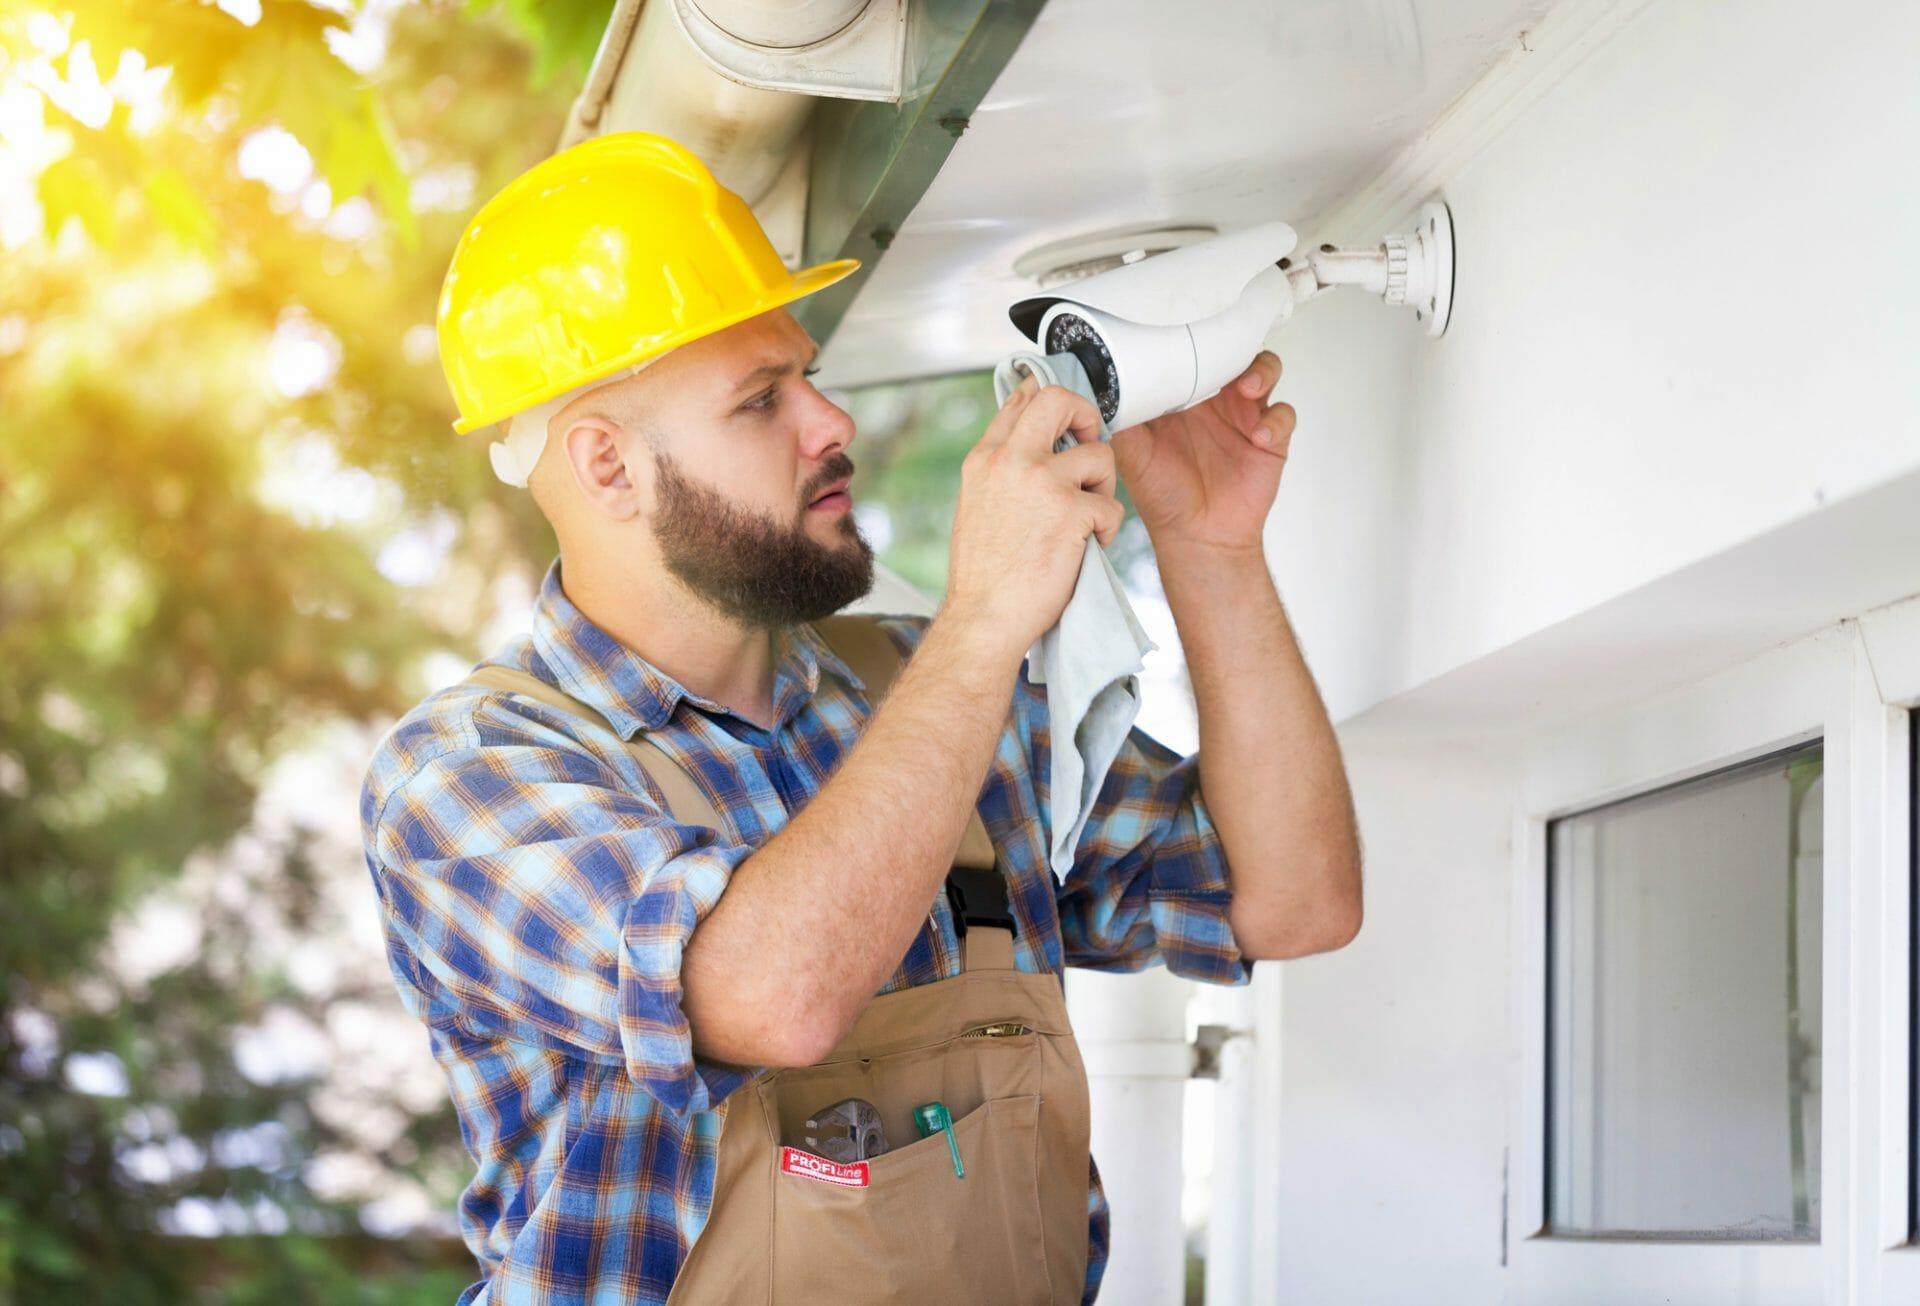 steps legal action against tradesmen